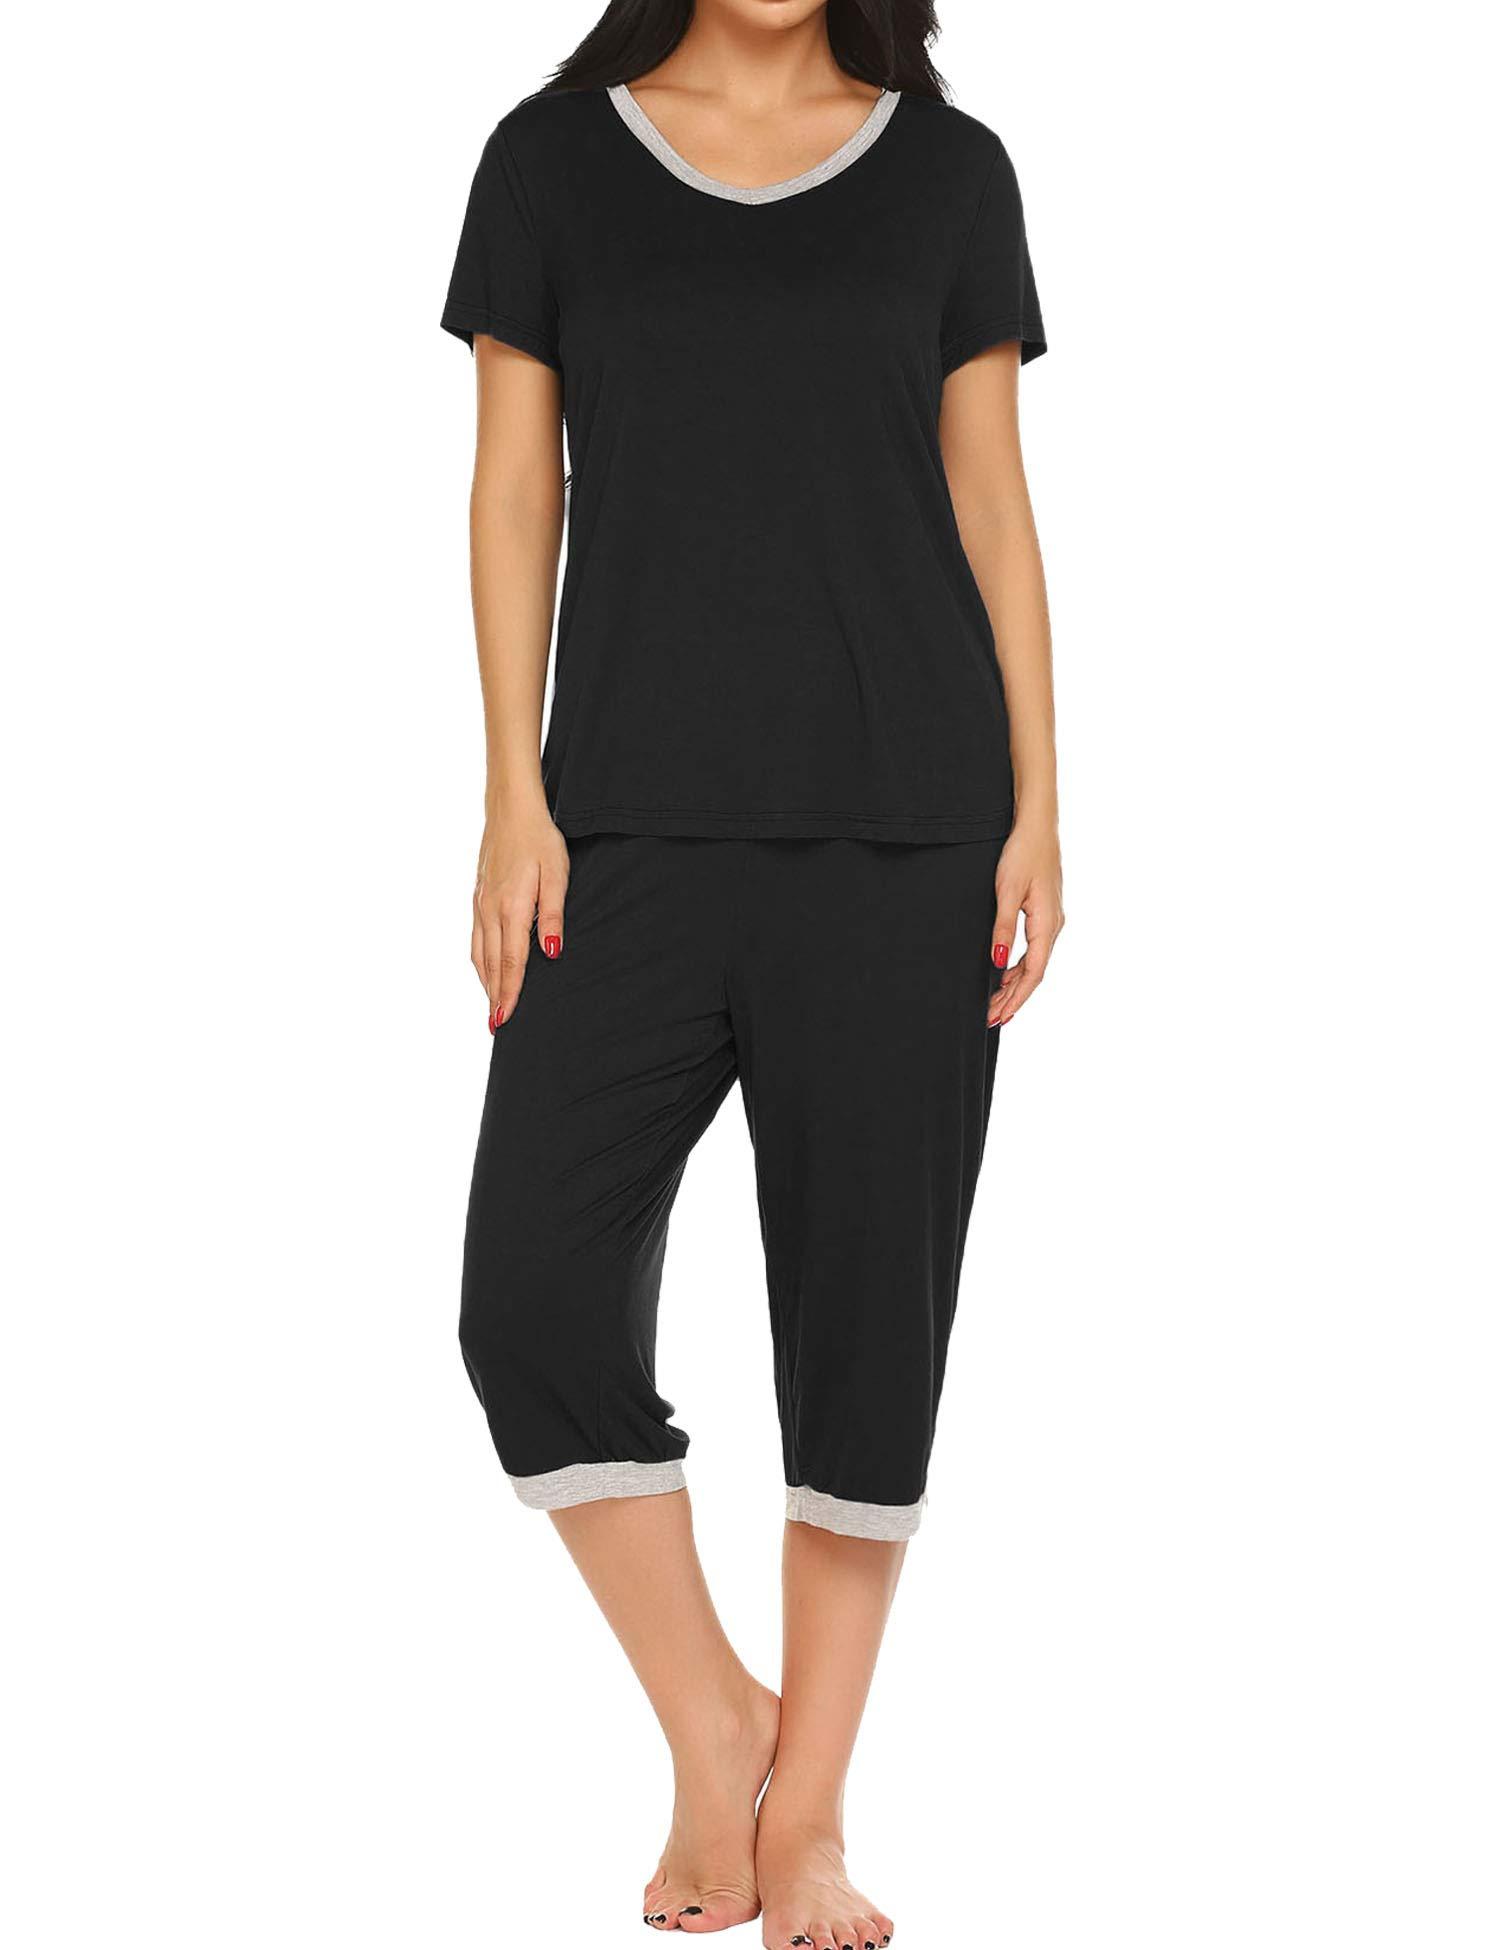 Ekouaer Pajama Set for Women Short Sleeve Tops & Capri Pants Sleepwear Comfy Loungewear S-XXL